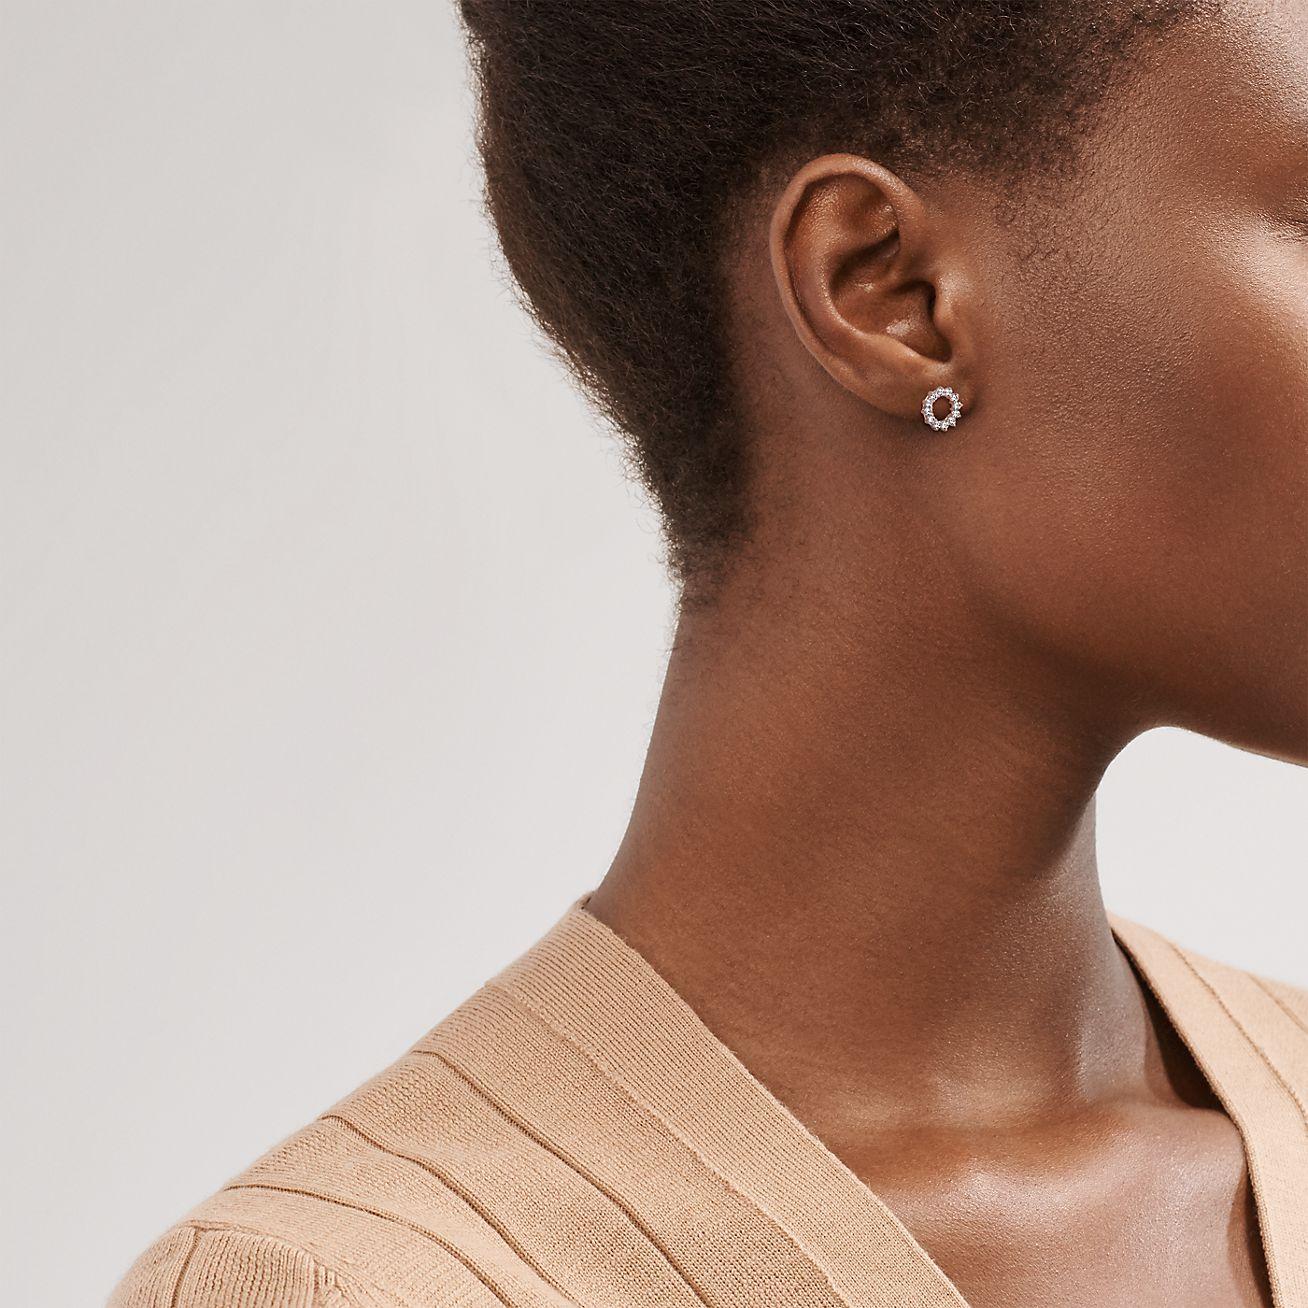 Open Circle Earrings Small Round Post Earrings Tiny Stud Earrings Wire Wrapped Circle Stud Earrings Pair Eternity Studs Rock Earrings